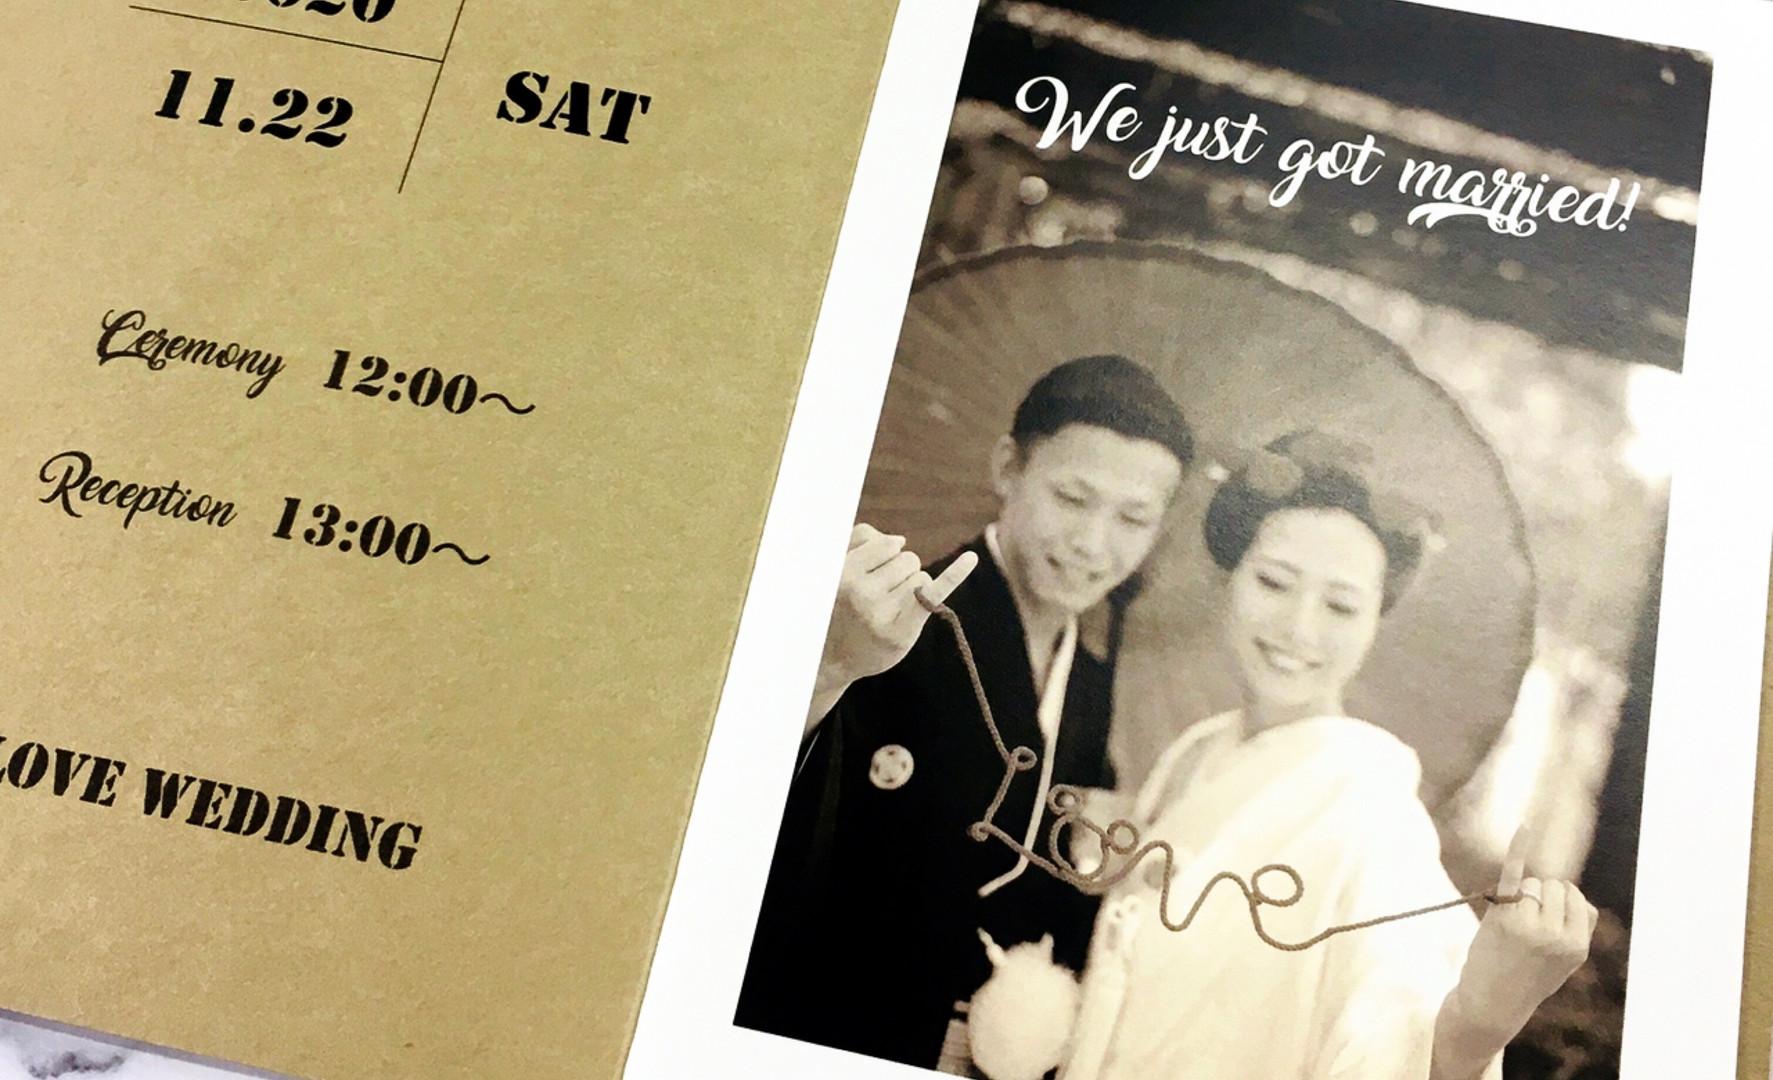 Just married デザイン2-B-3.jpg